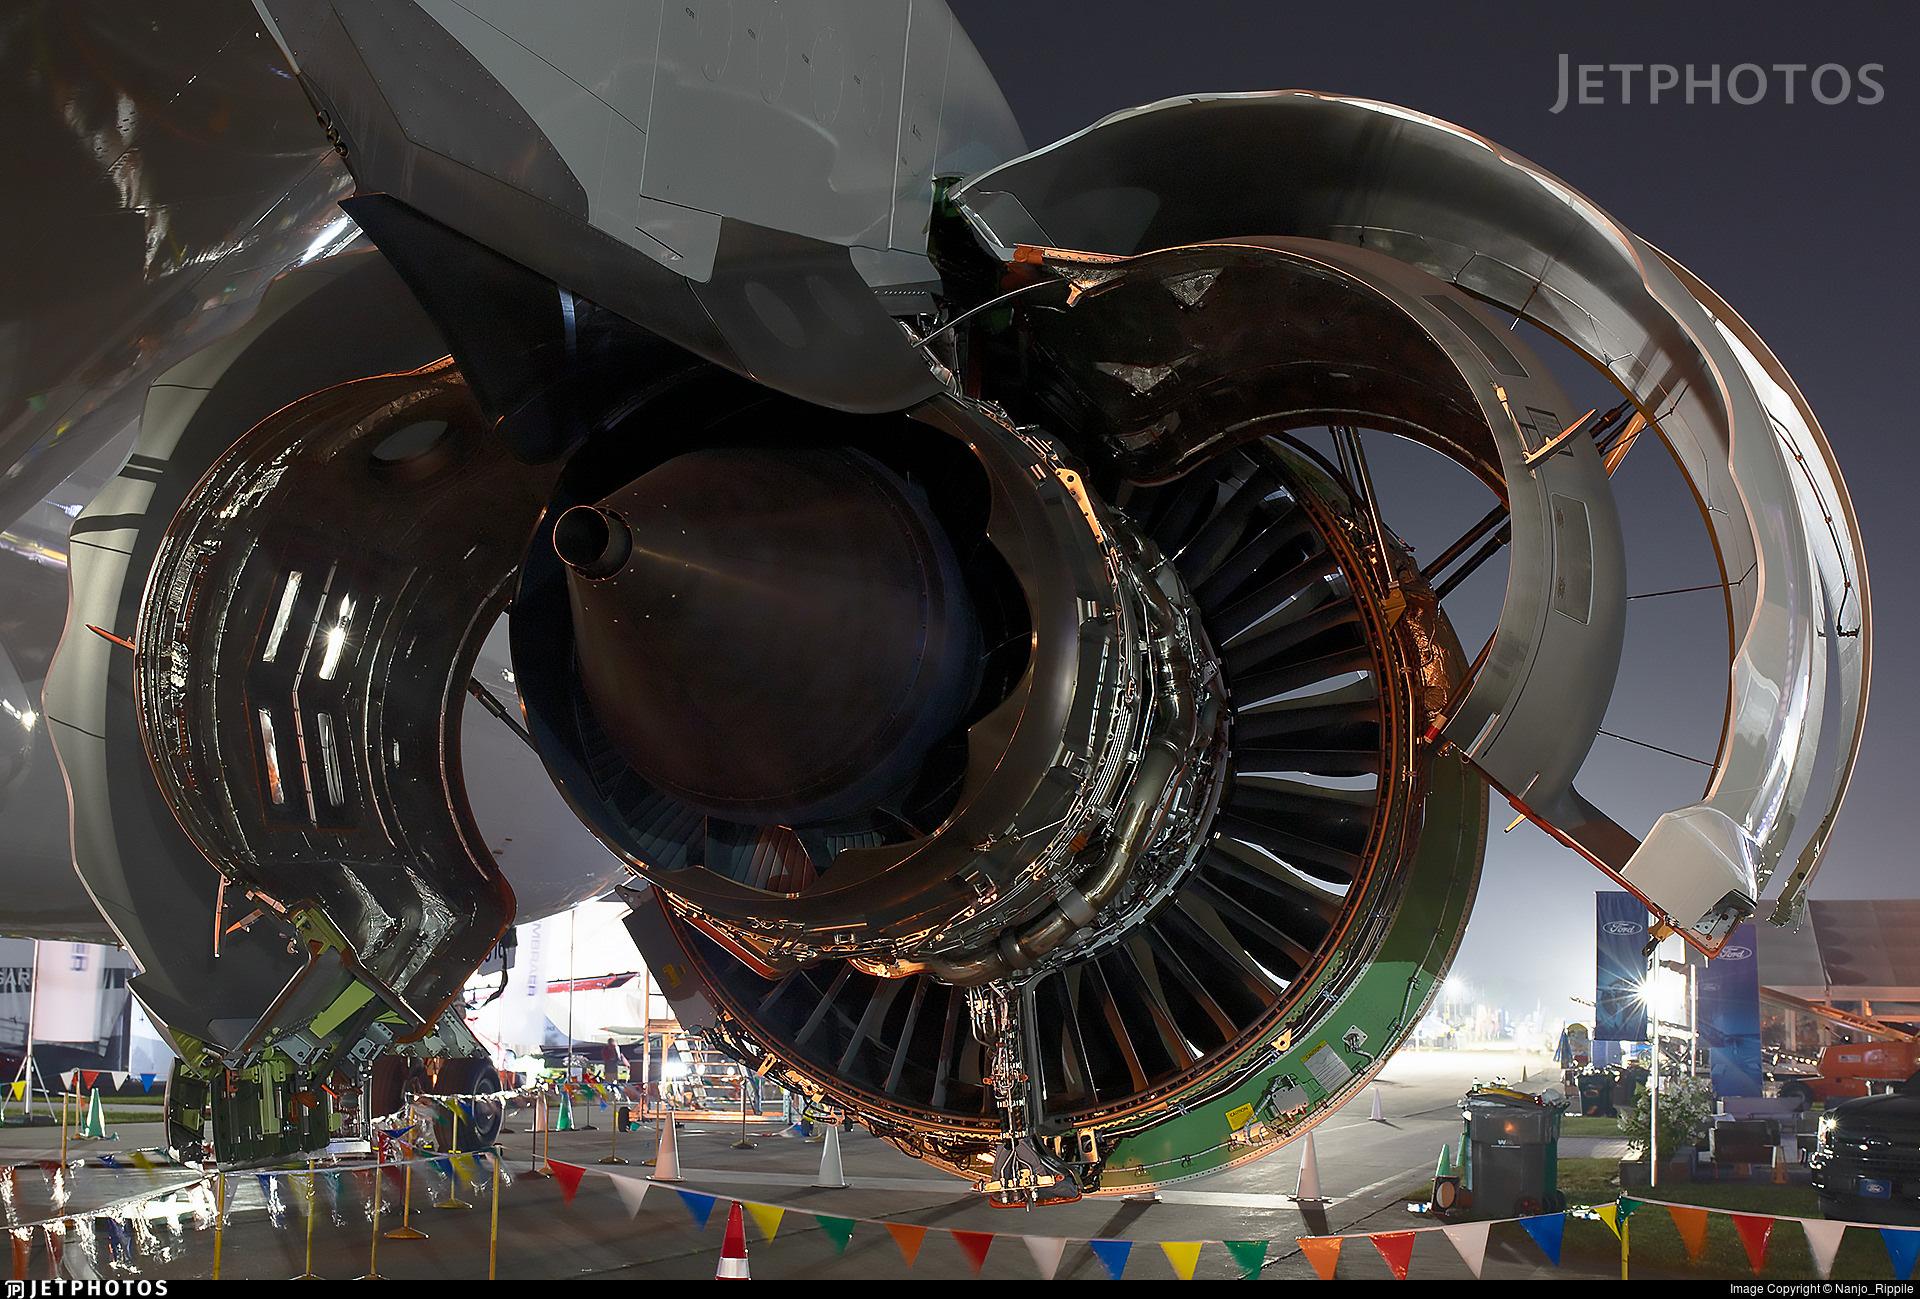 Open GE-Nx engine